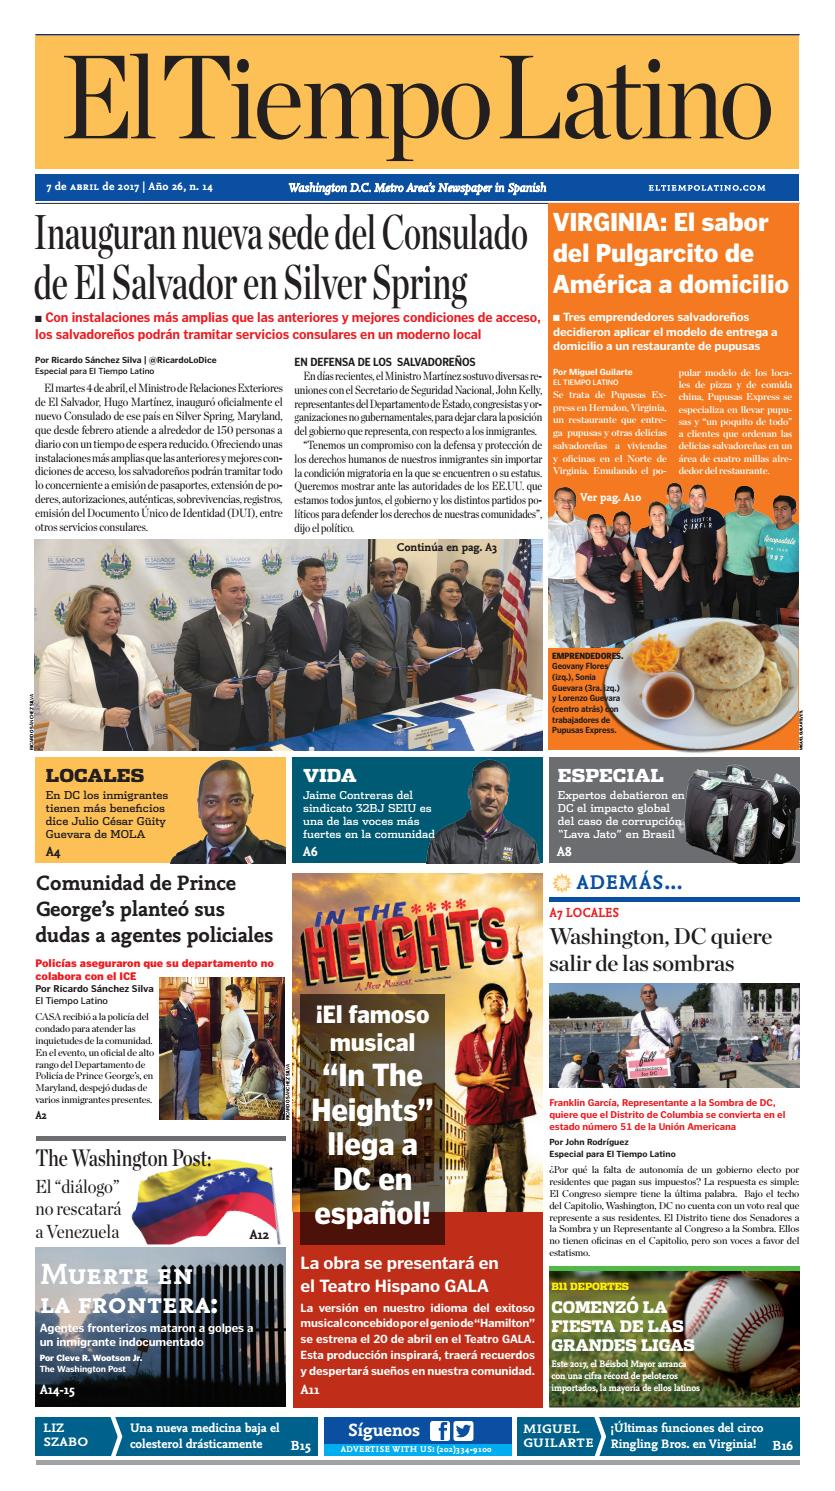 ETL 4-7-17 by El Tiempo Latino /TWP - issuu